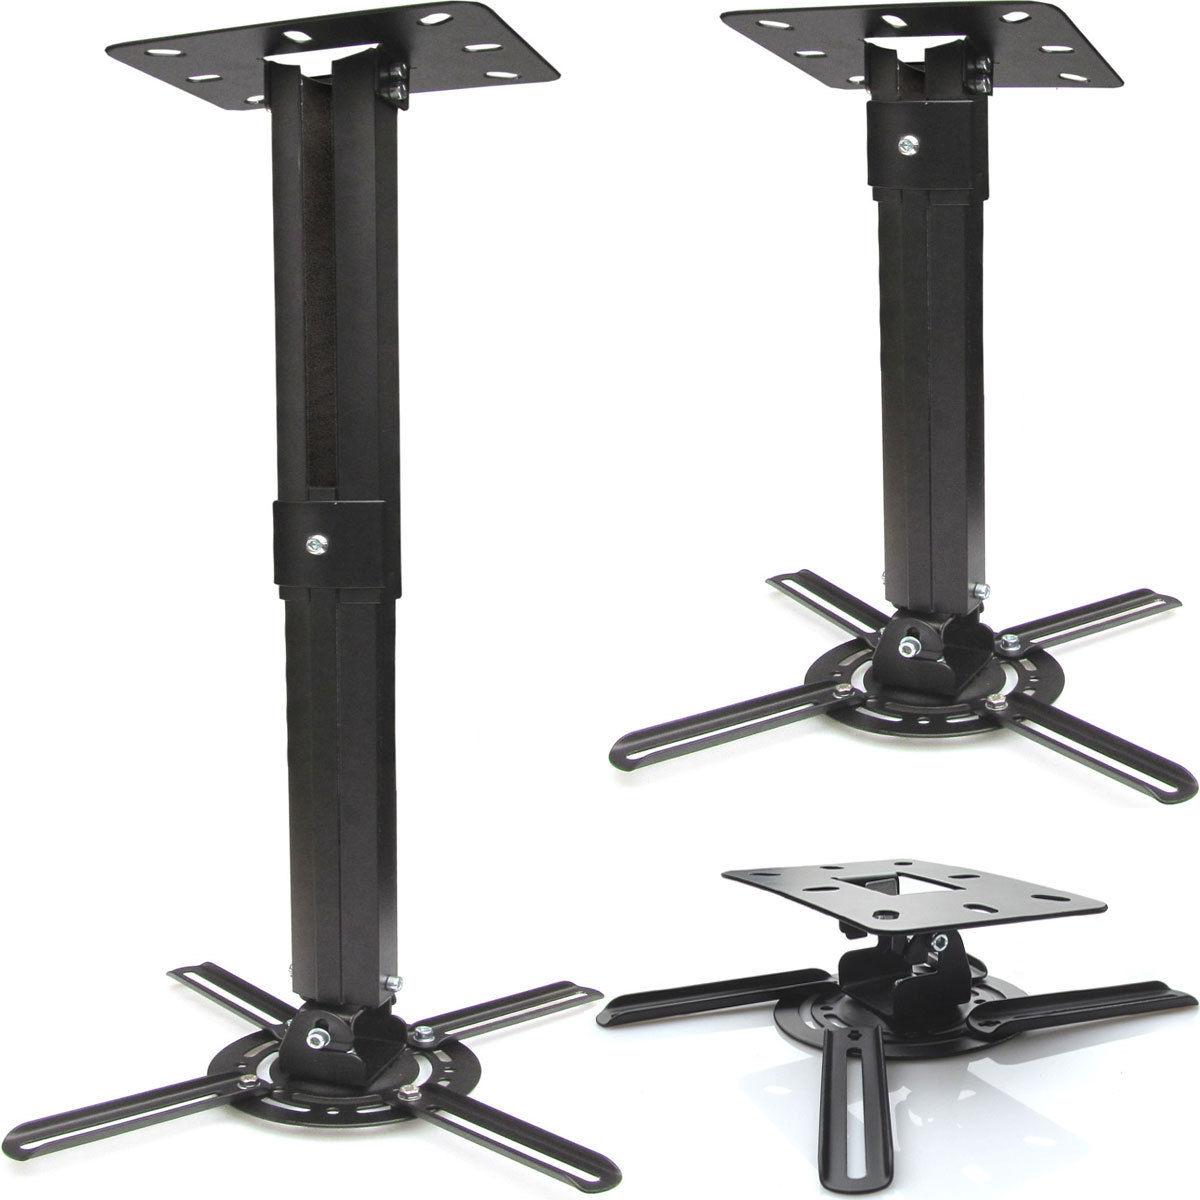 Tv drehbar 360° Beamer Projektor Deckenhalterung drehbar 360° ausziehbar bis 55 cm ...